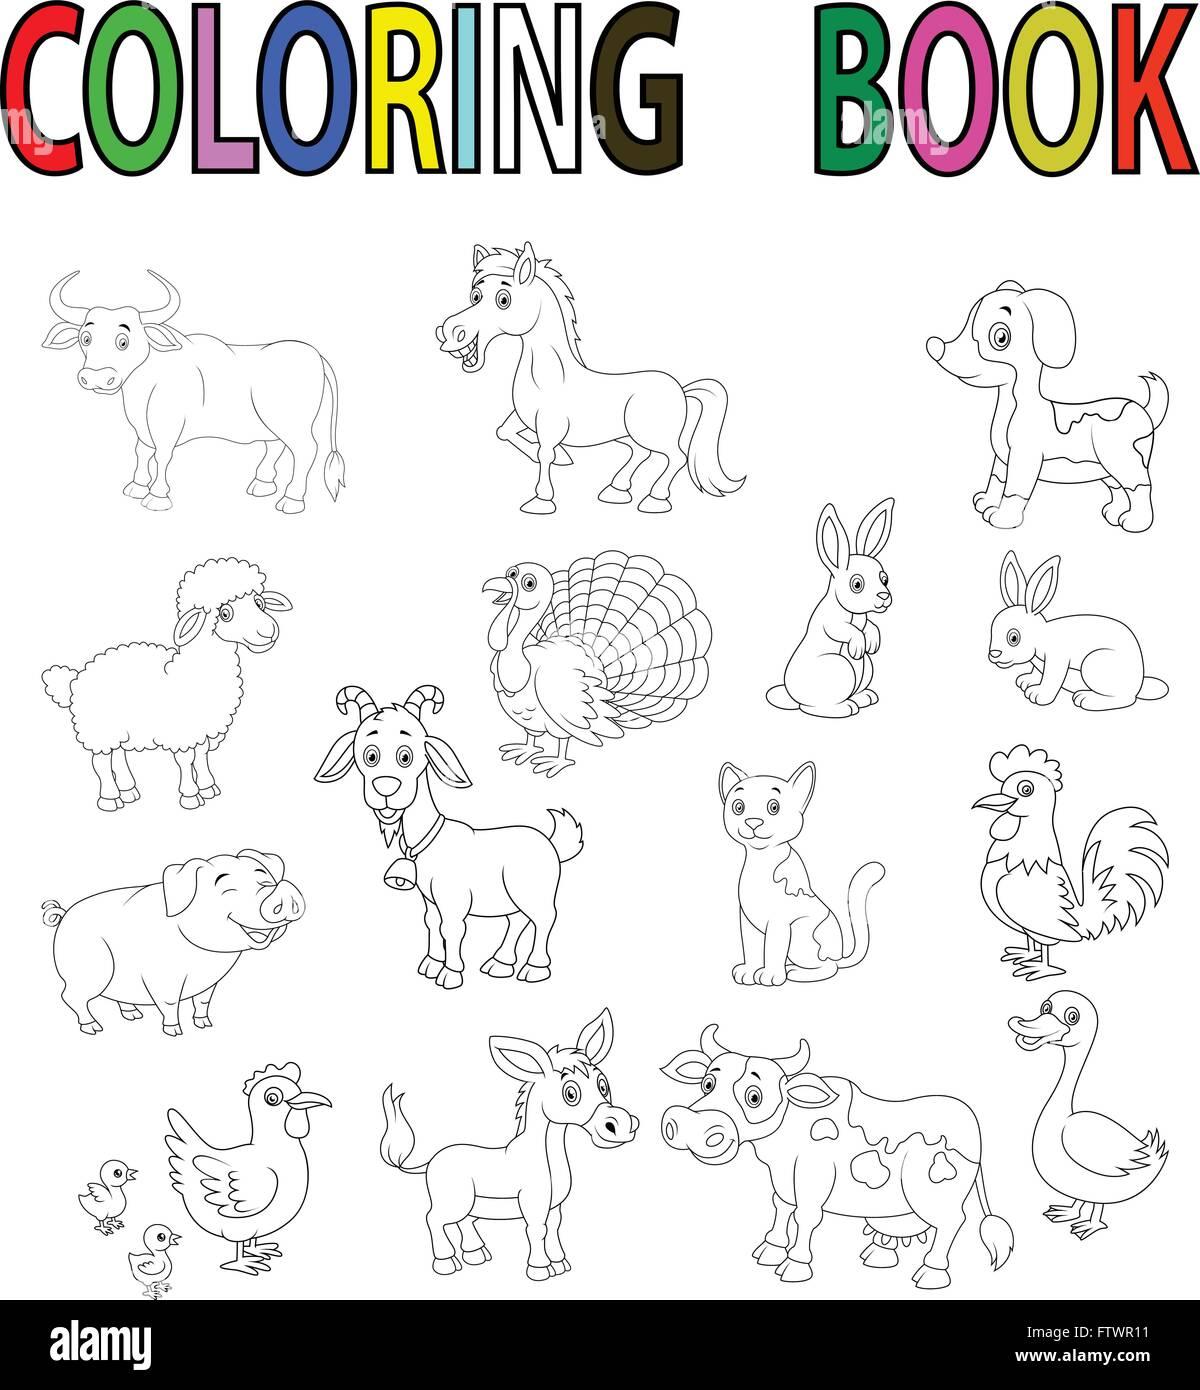 Farm animal coloring book Stock Vector Art & Illustration ...